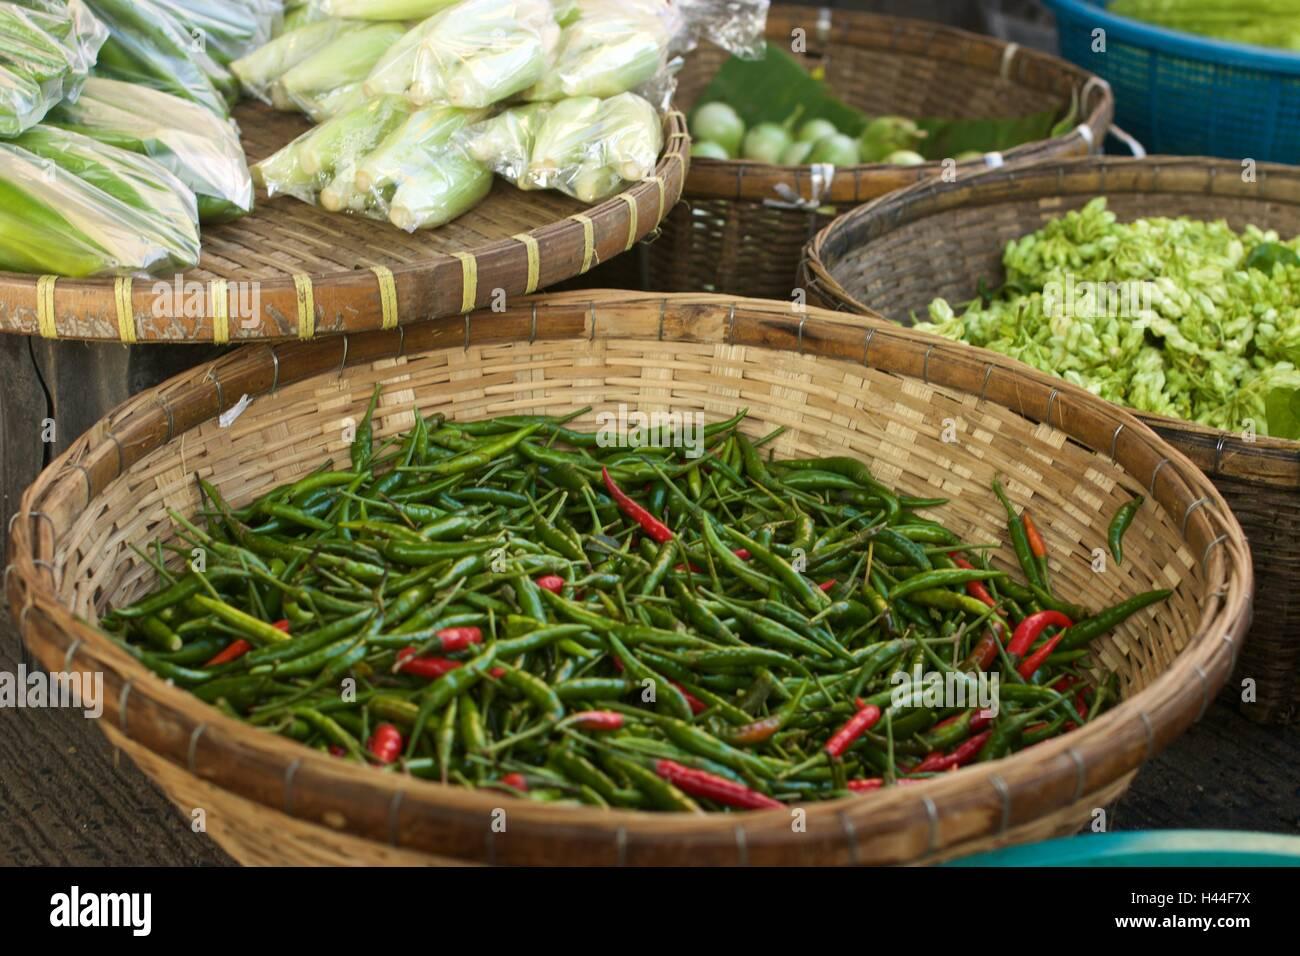 Chilli Padi, Bird's Eye Chilli, Bird Chilli, Thai pepper on Threshing basket. - Stock Image